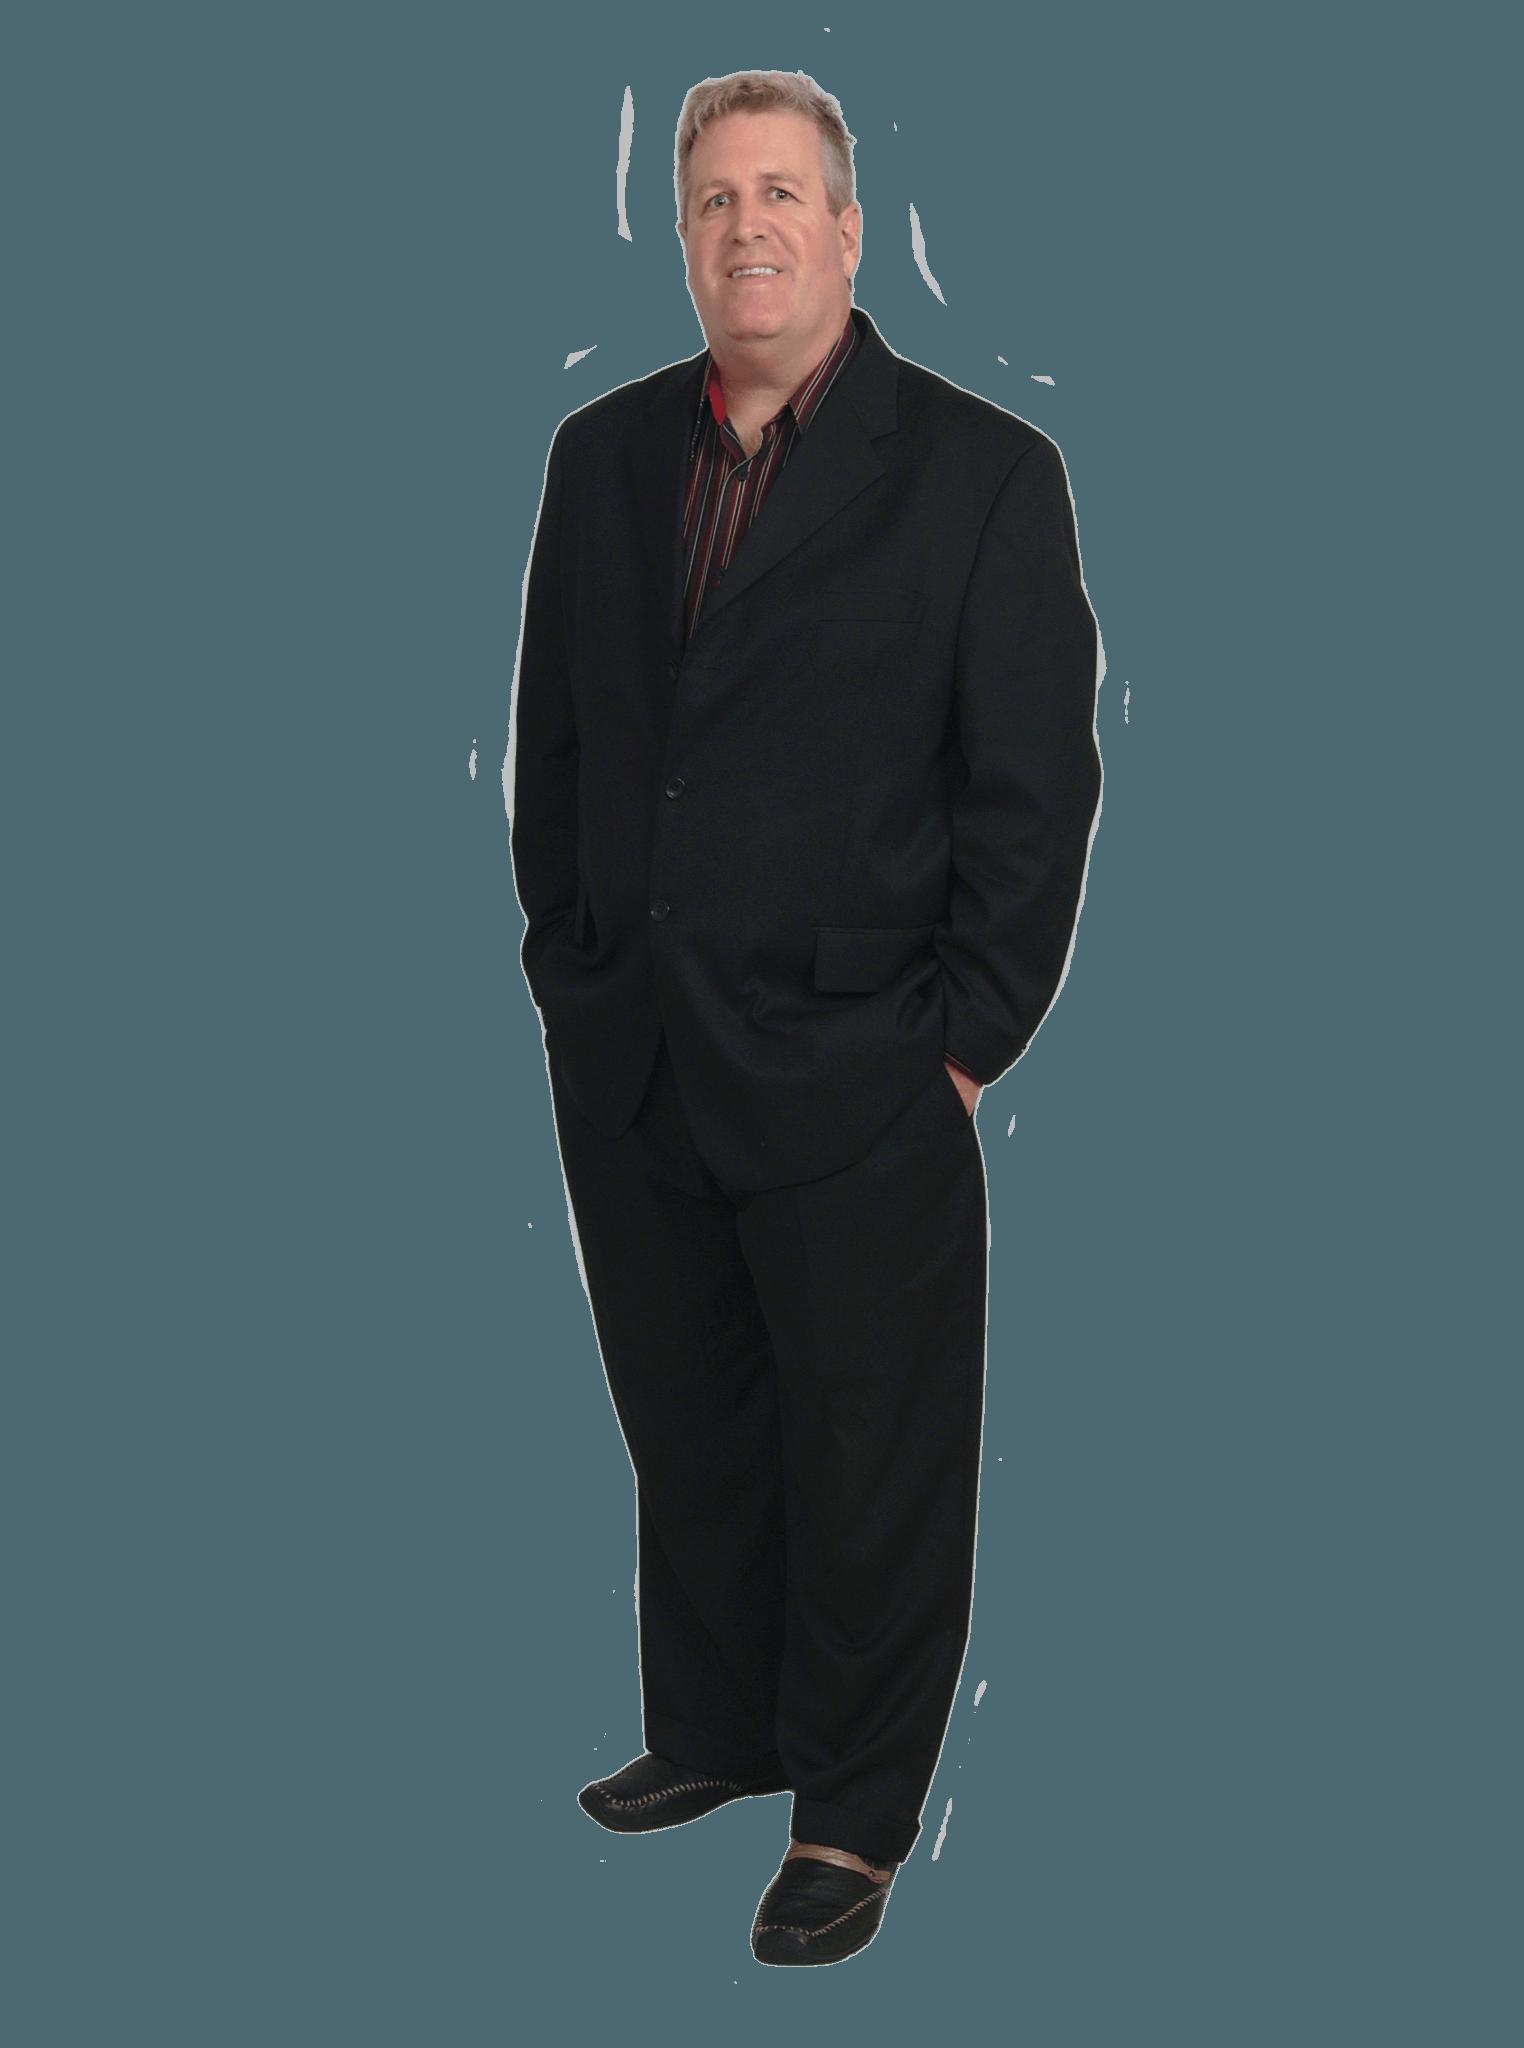 Jason Crabtree Founder of Marketing Bionics (A Clearwater Florida SEO Company)